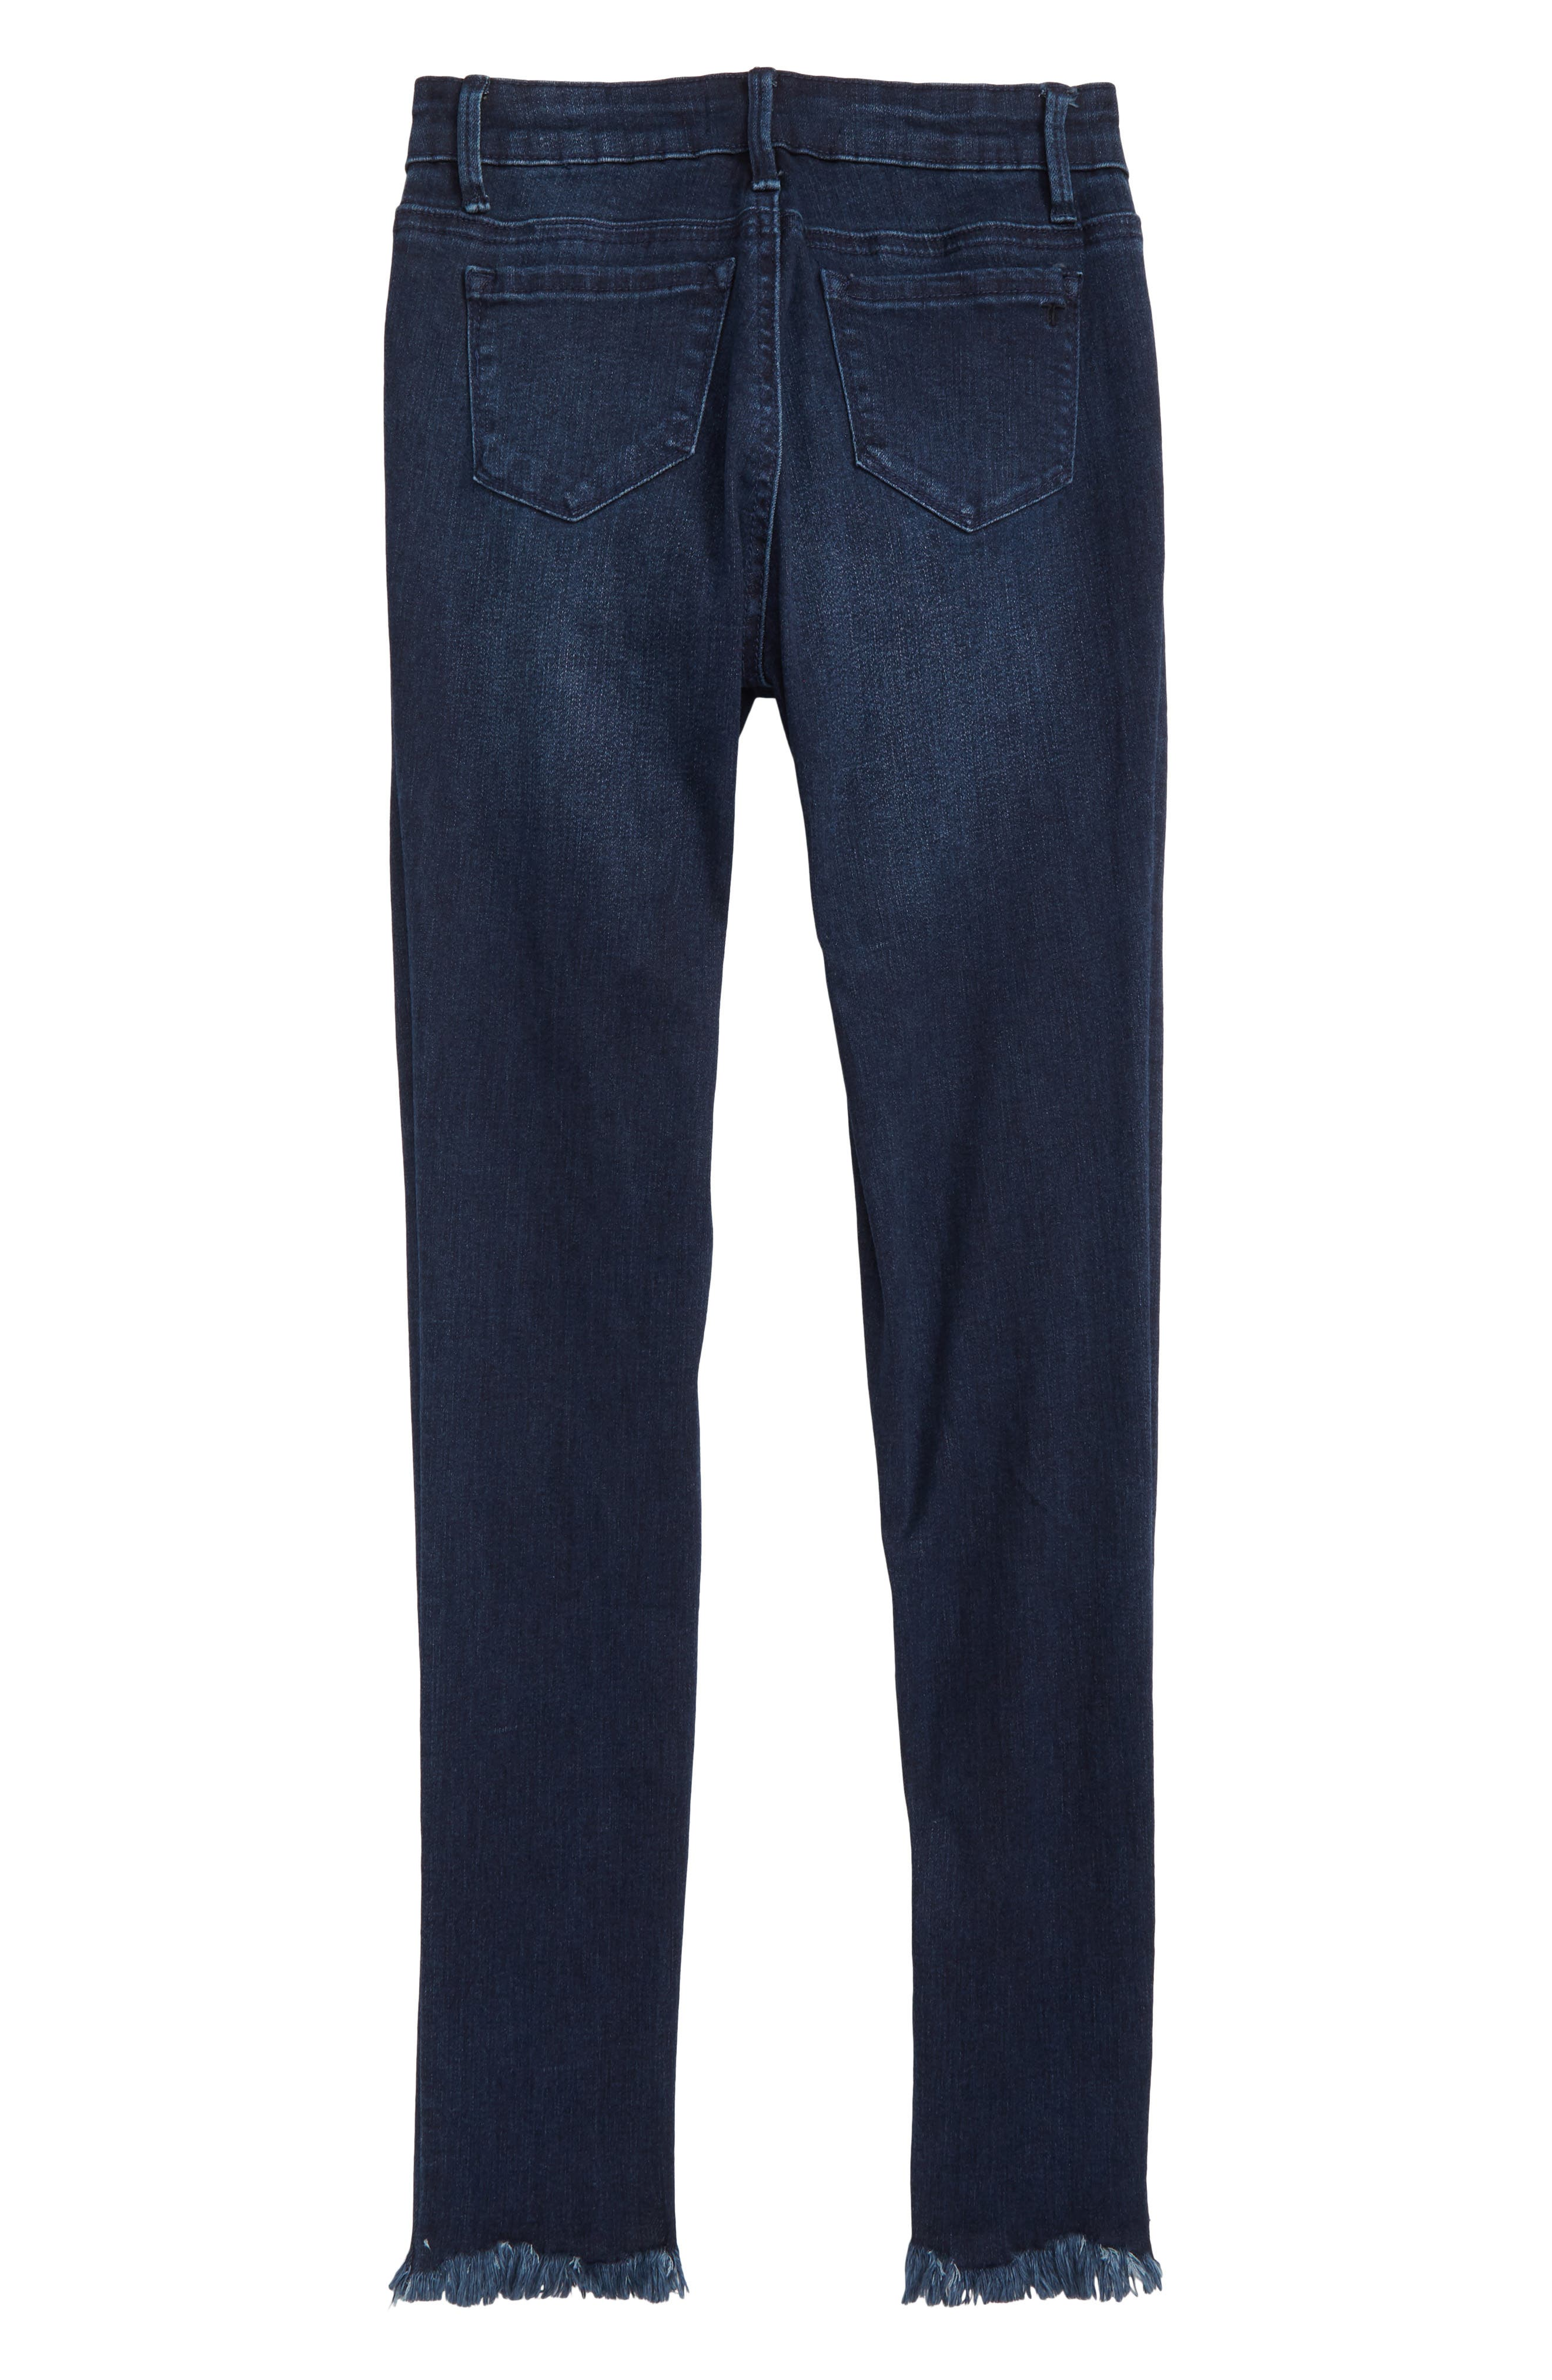 Studded Fray Hem Skinny Jeans,                             Alternate thumbnail 2, color,                             INDIGO